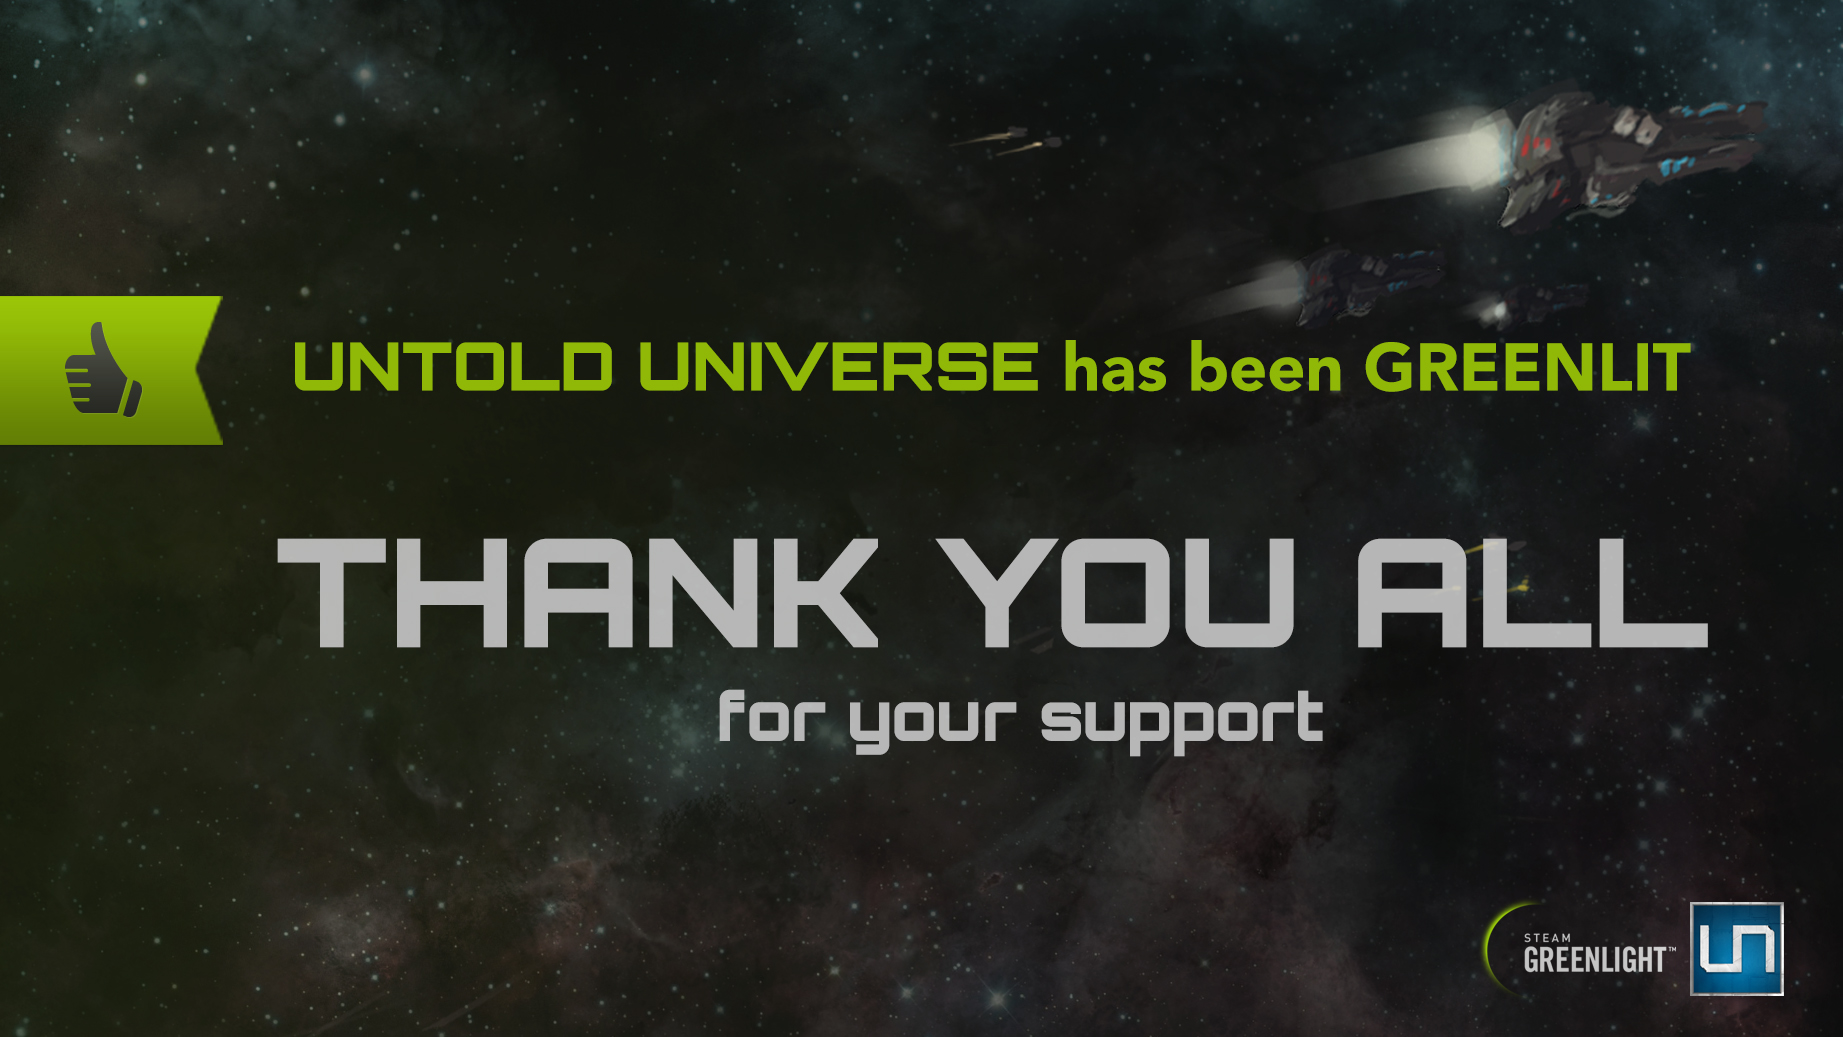 Untold Universe Greenlit - 08/01/15